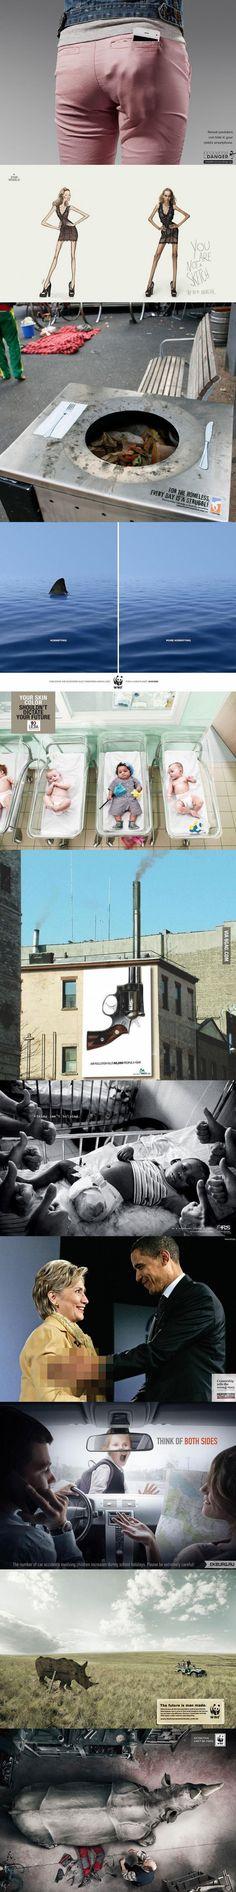 11 Brilliant Advertisements.